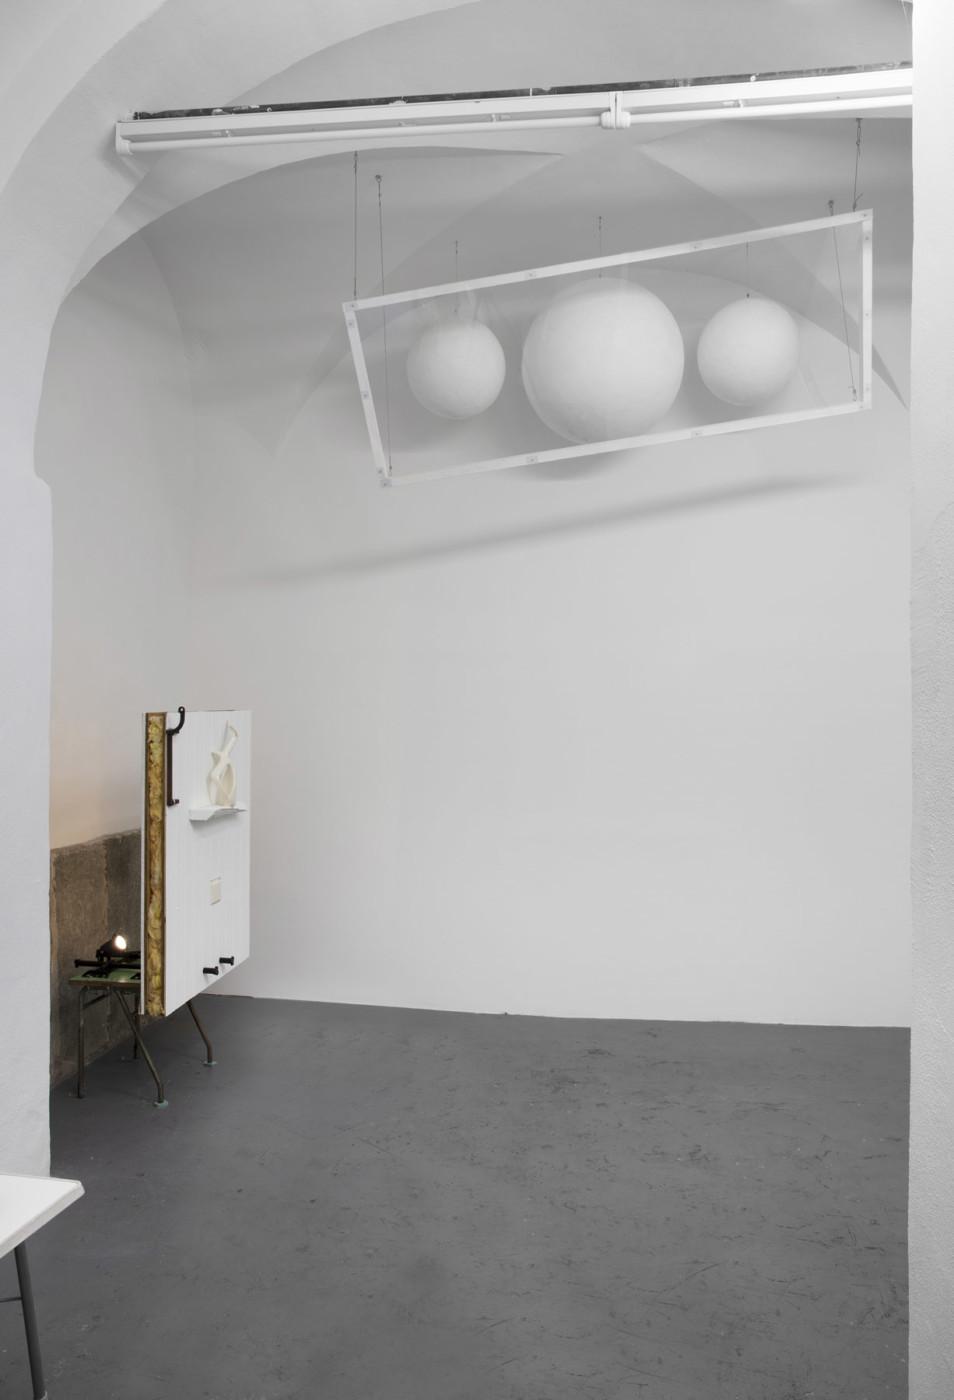 BRADLEY KRONZ  Bradley Kronz,  2020, Bar, Torino, Italy, installation view - High Art Gallery Paris